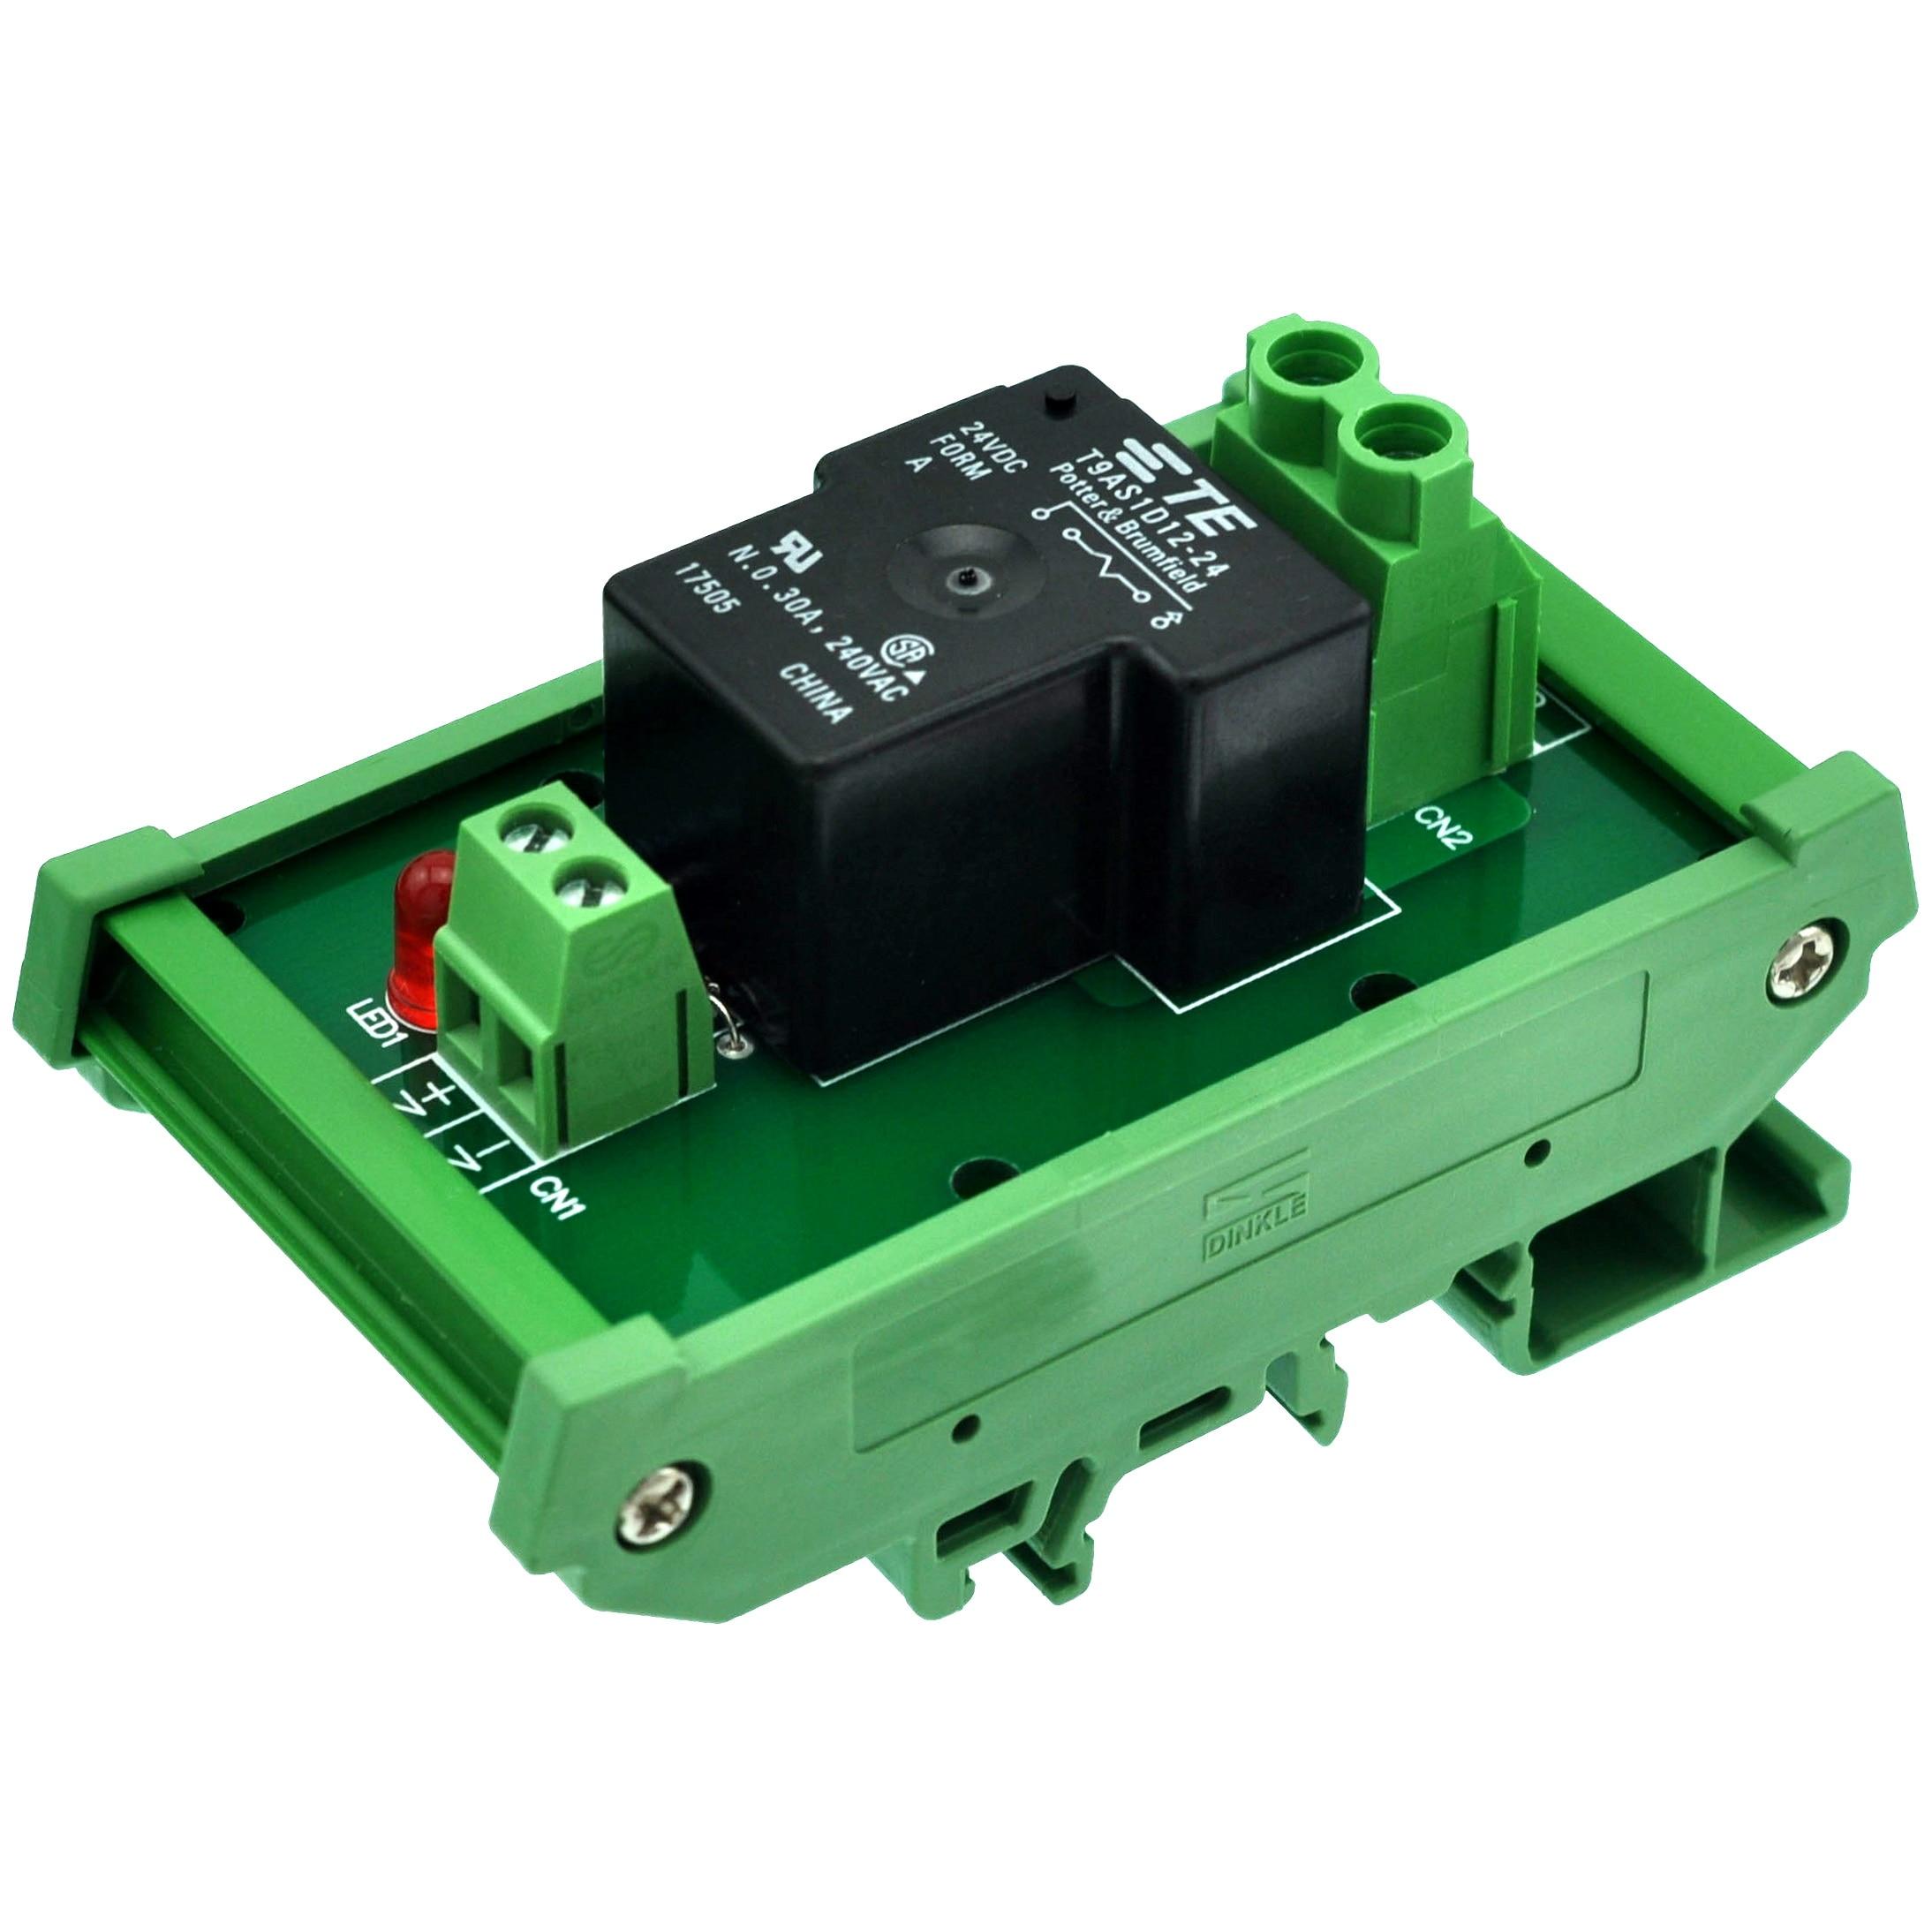 CZH-Labs DIN Rail Mount 24V Passive SPST-NO 30Amp Power Relay Module.